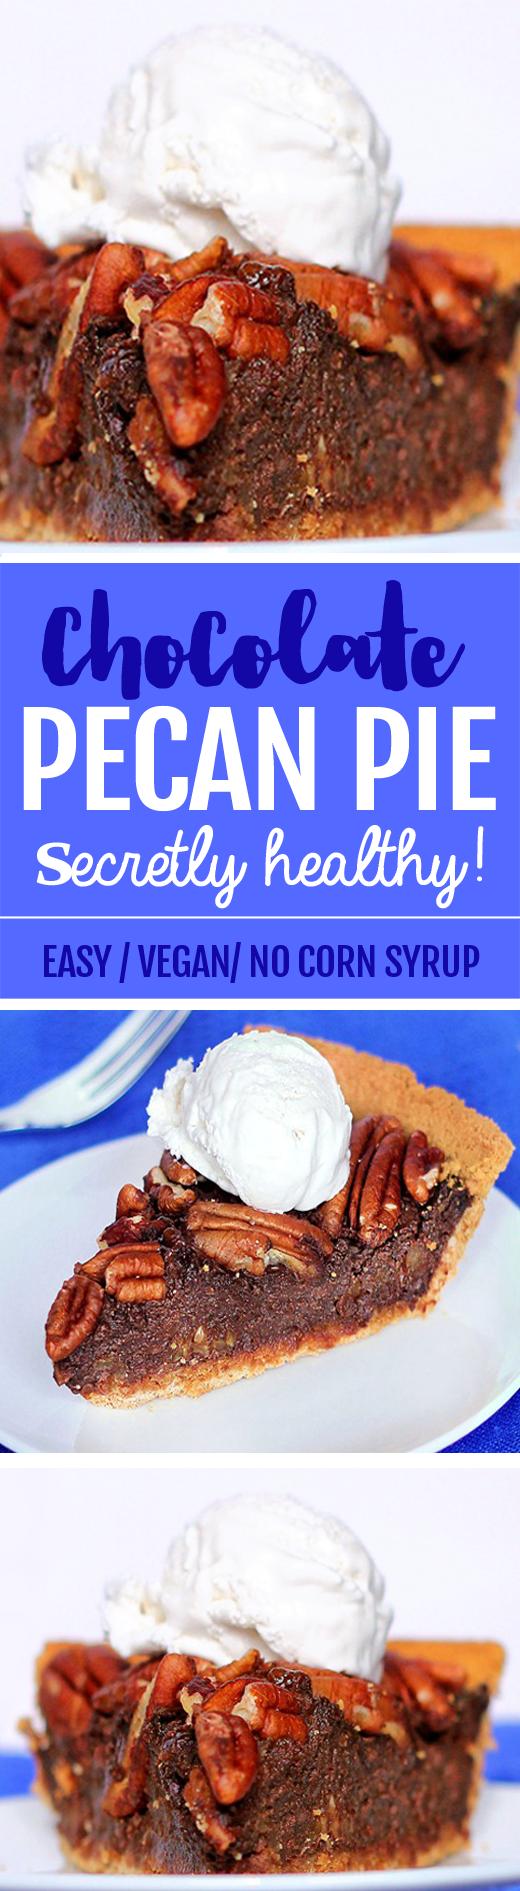 This healthy chocolate pecan pie is amazing! #vegan #dessert #chocolate #healthy #recipe